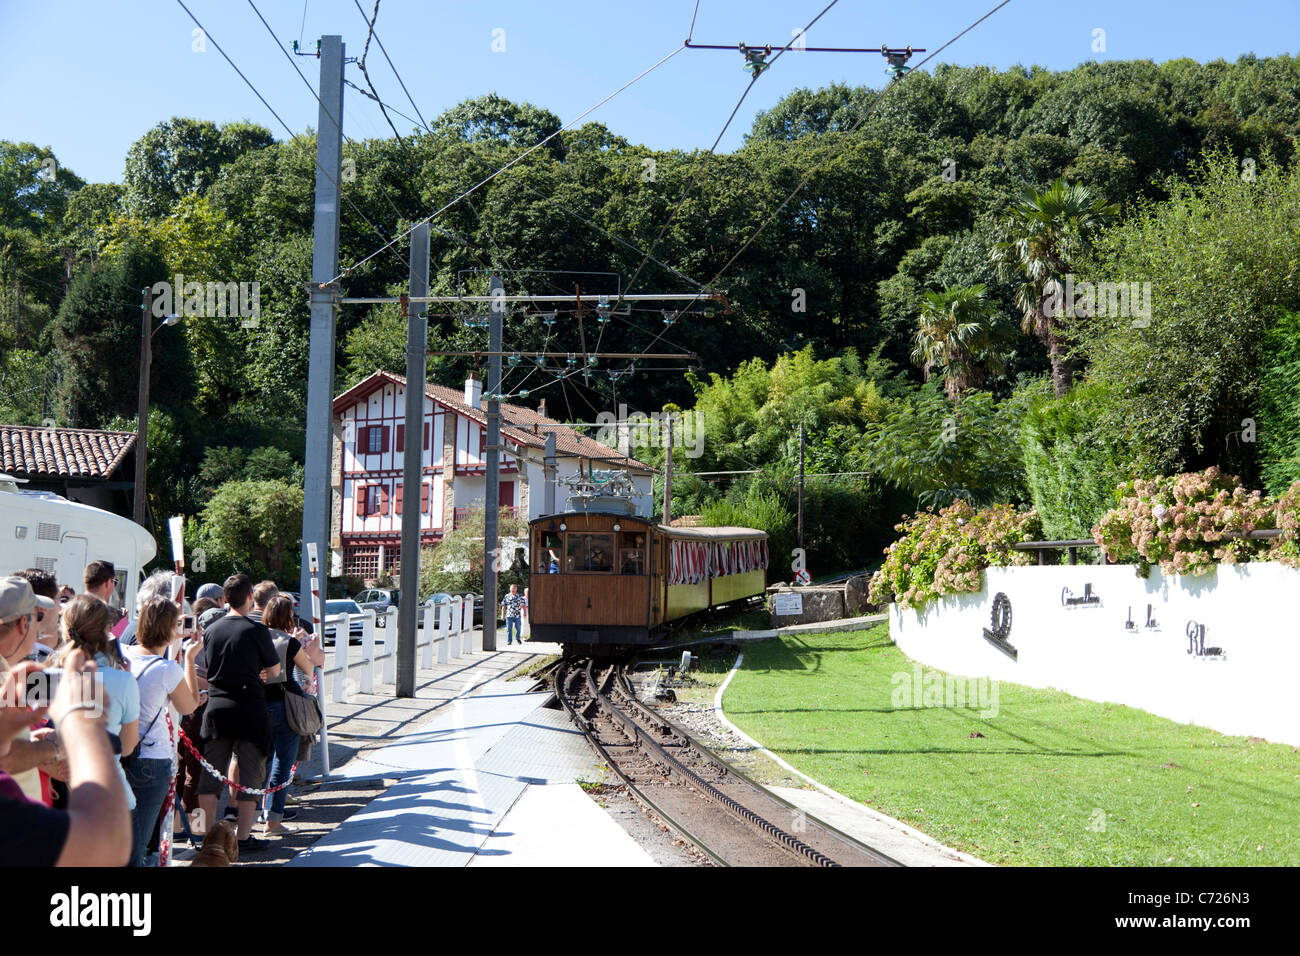 Ankunft am Bahnhof von Rhune Zahnradbahn Zug (Frankreich). Arrivée de Gare du Train À Crémaillère Stockbild